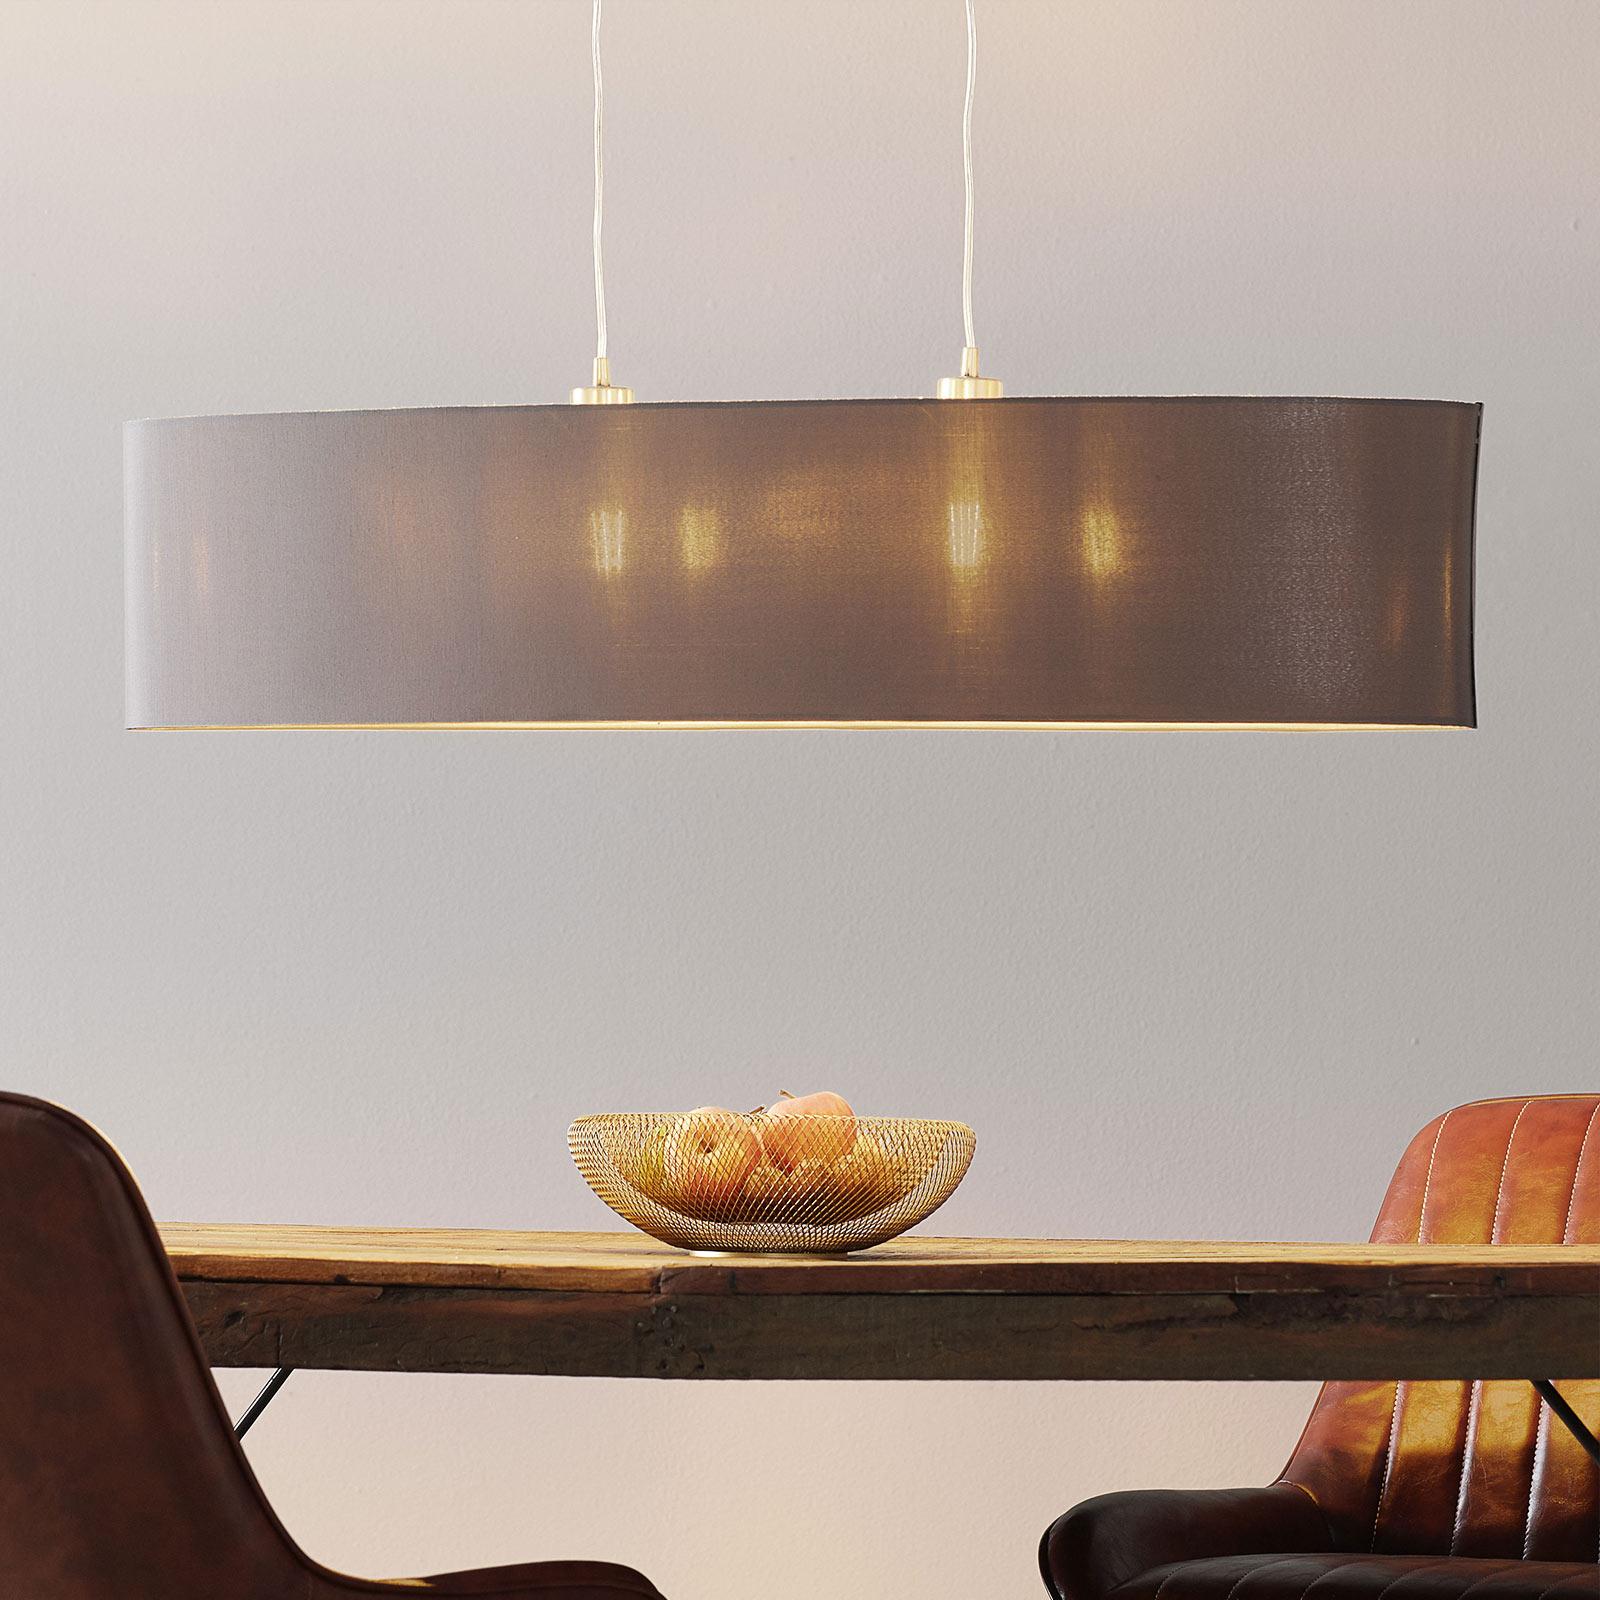 Lámpara colgante Maserlo oval cappuccino 100 cm